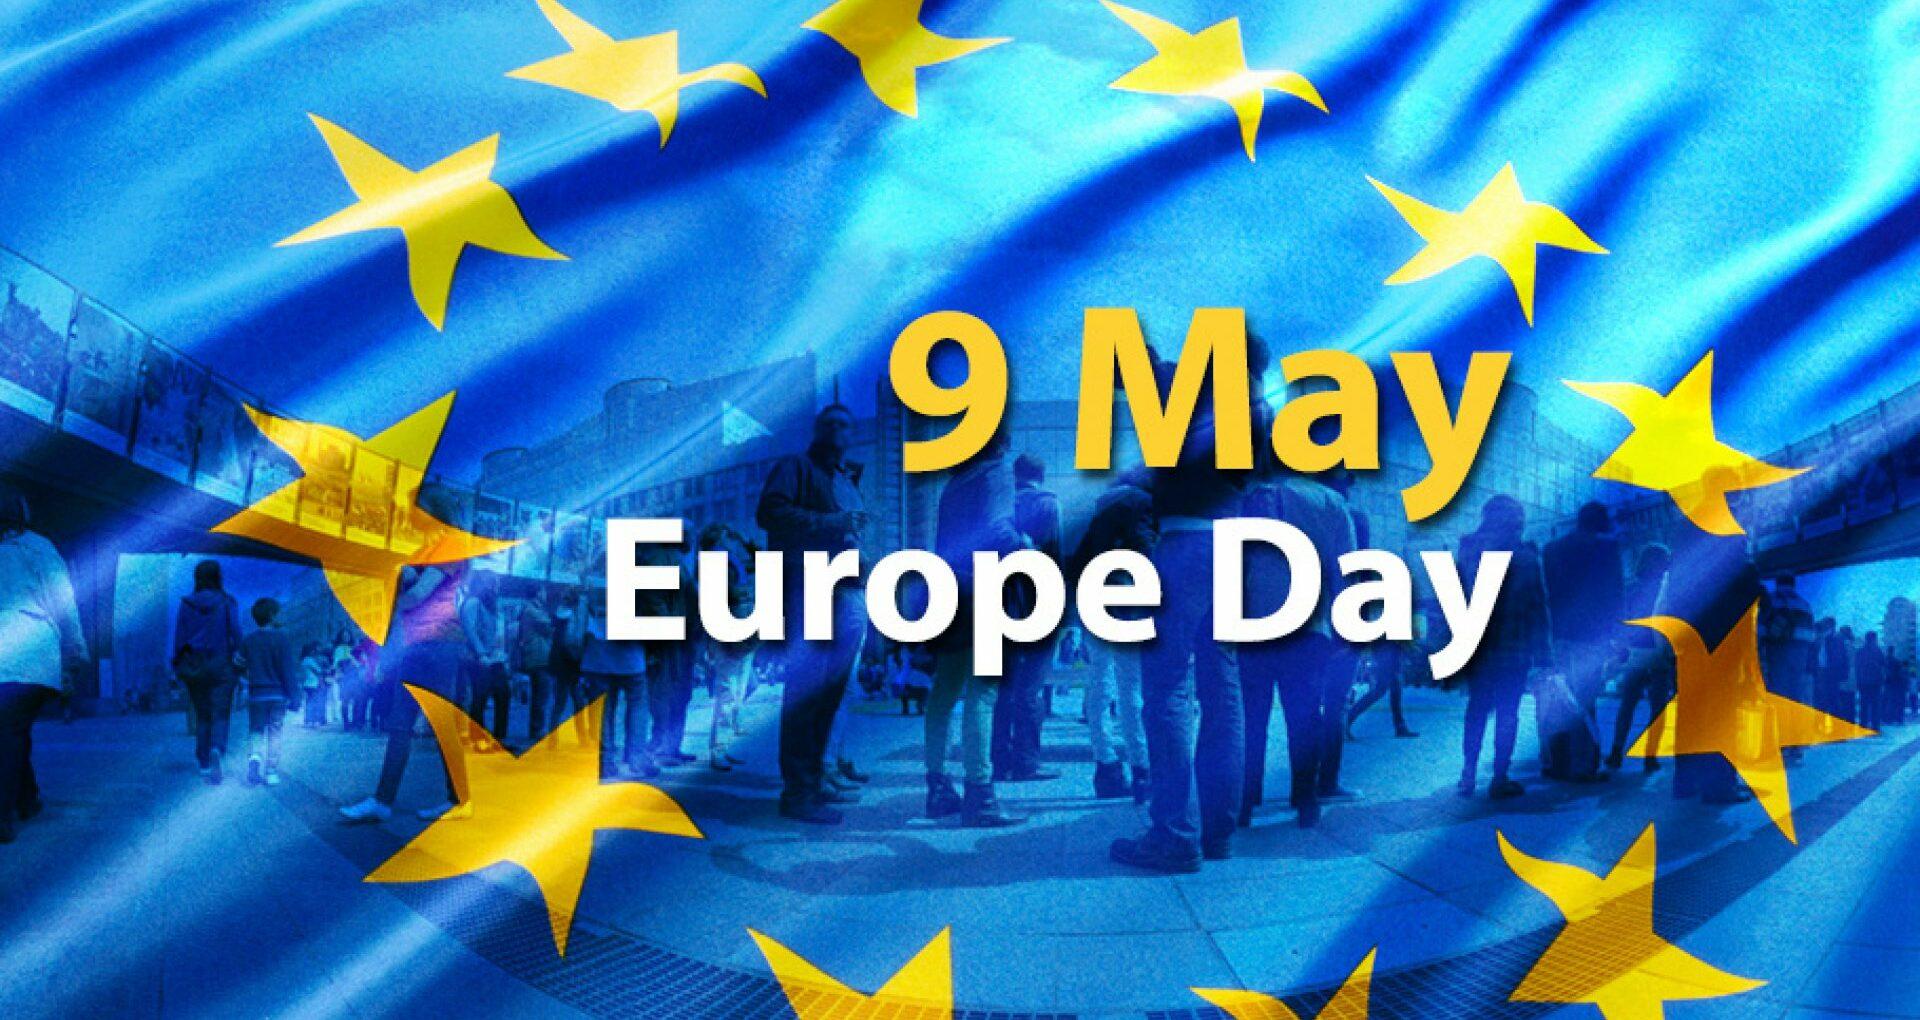 The Ambassadors of the EU Member States to Moldova Wish Happy Europe Day to Moldovans